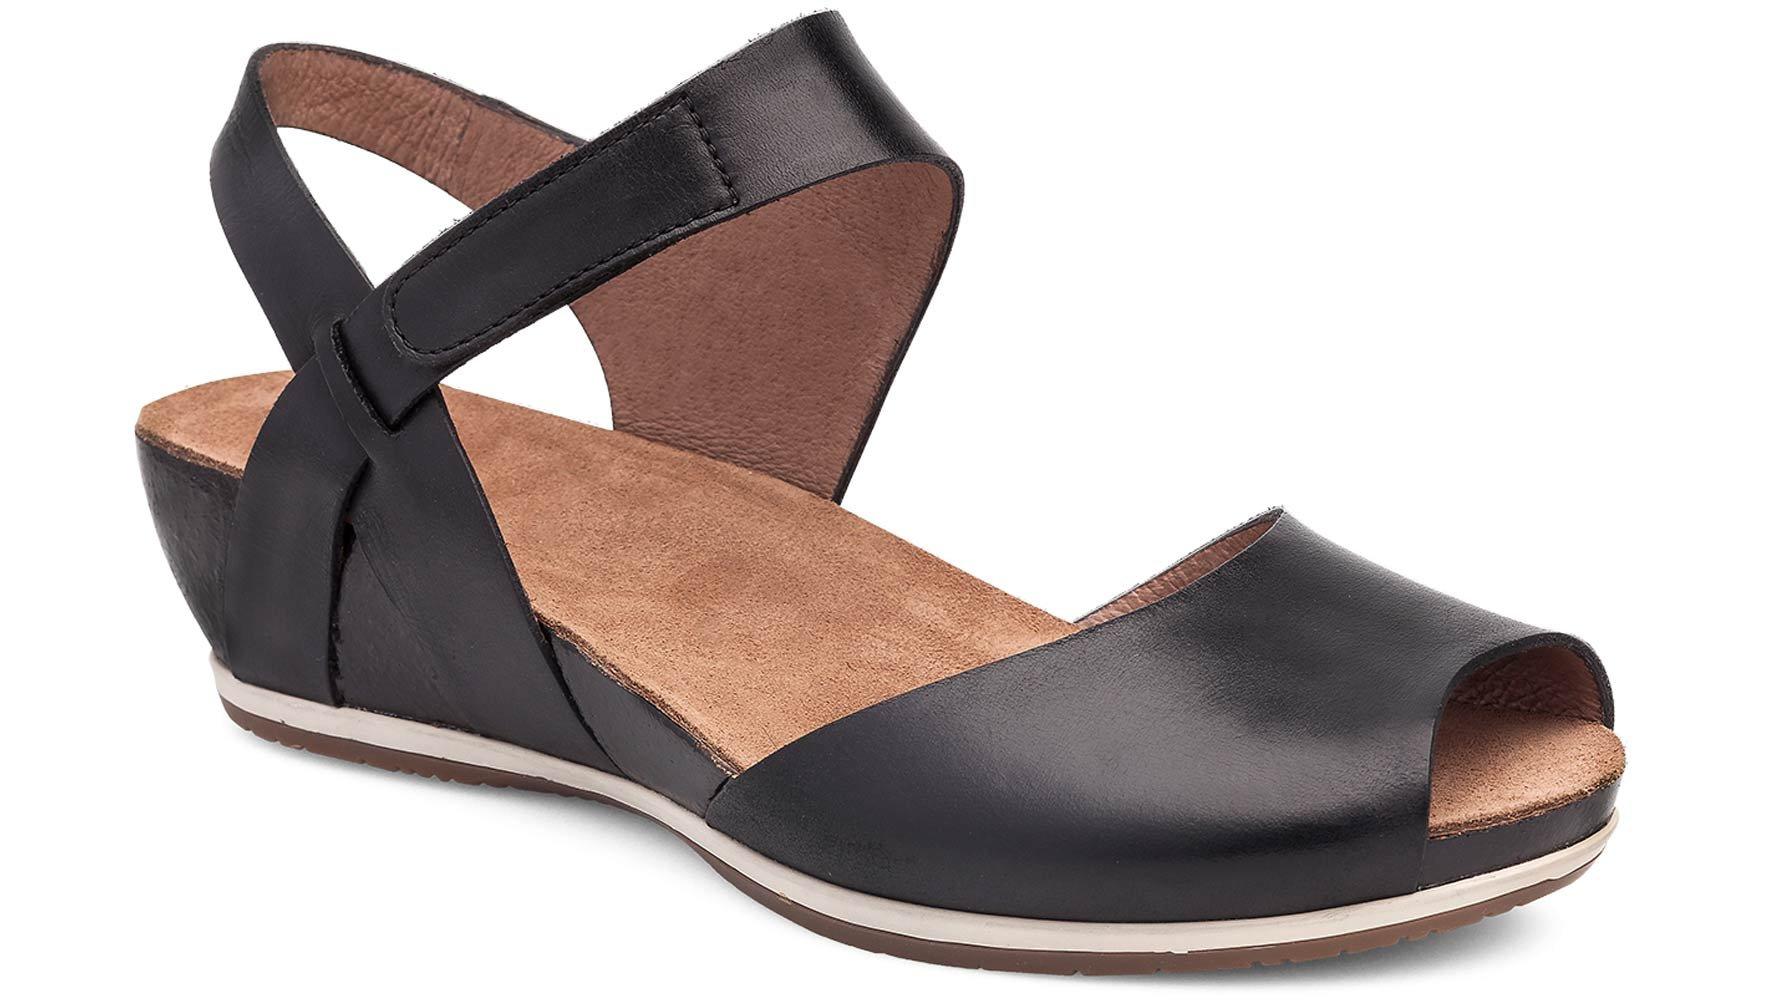 Dansko Women's Vera Flat Sandal, Black Burnished, 38 M EU (7.5-8 US) by Dansko (Image #1)